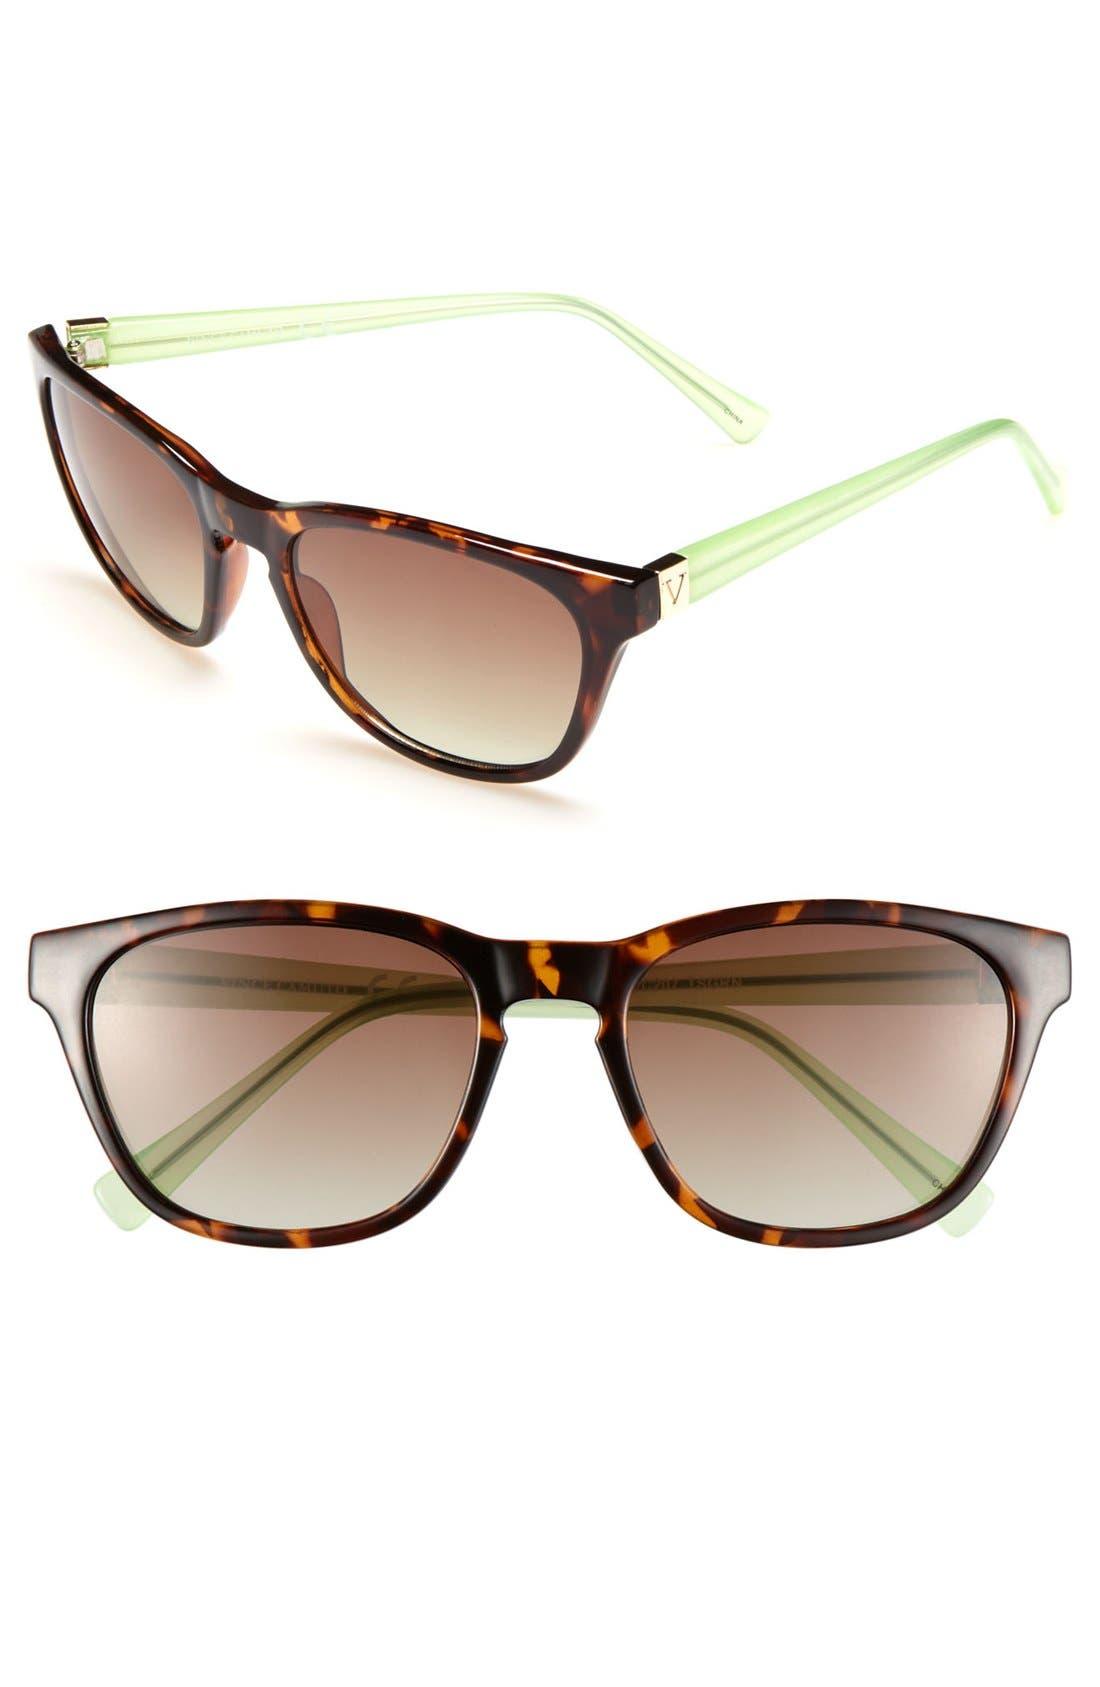 Main Image - Vince Camuto 57mm Retro Sunglasses